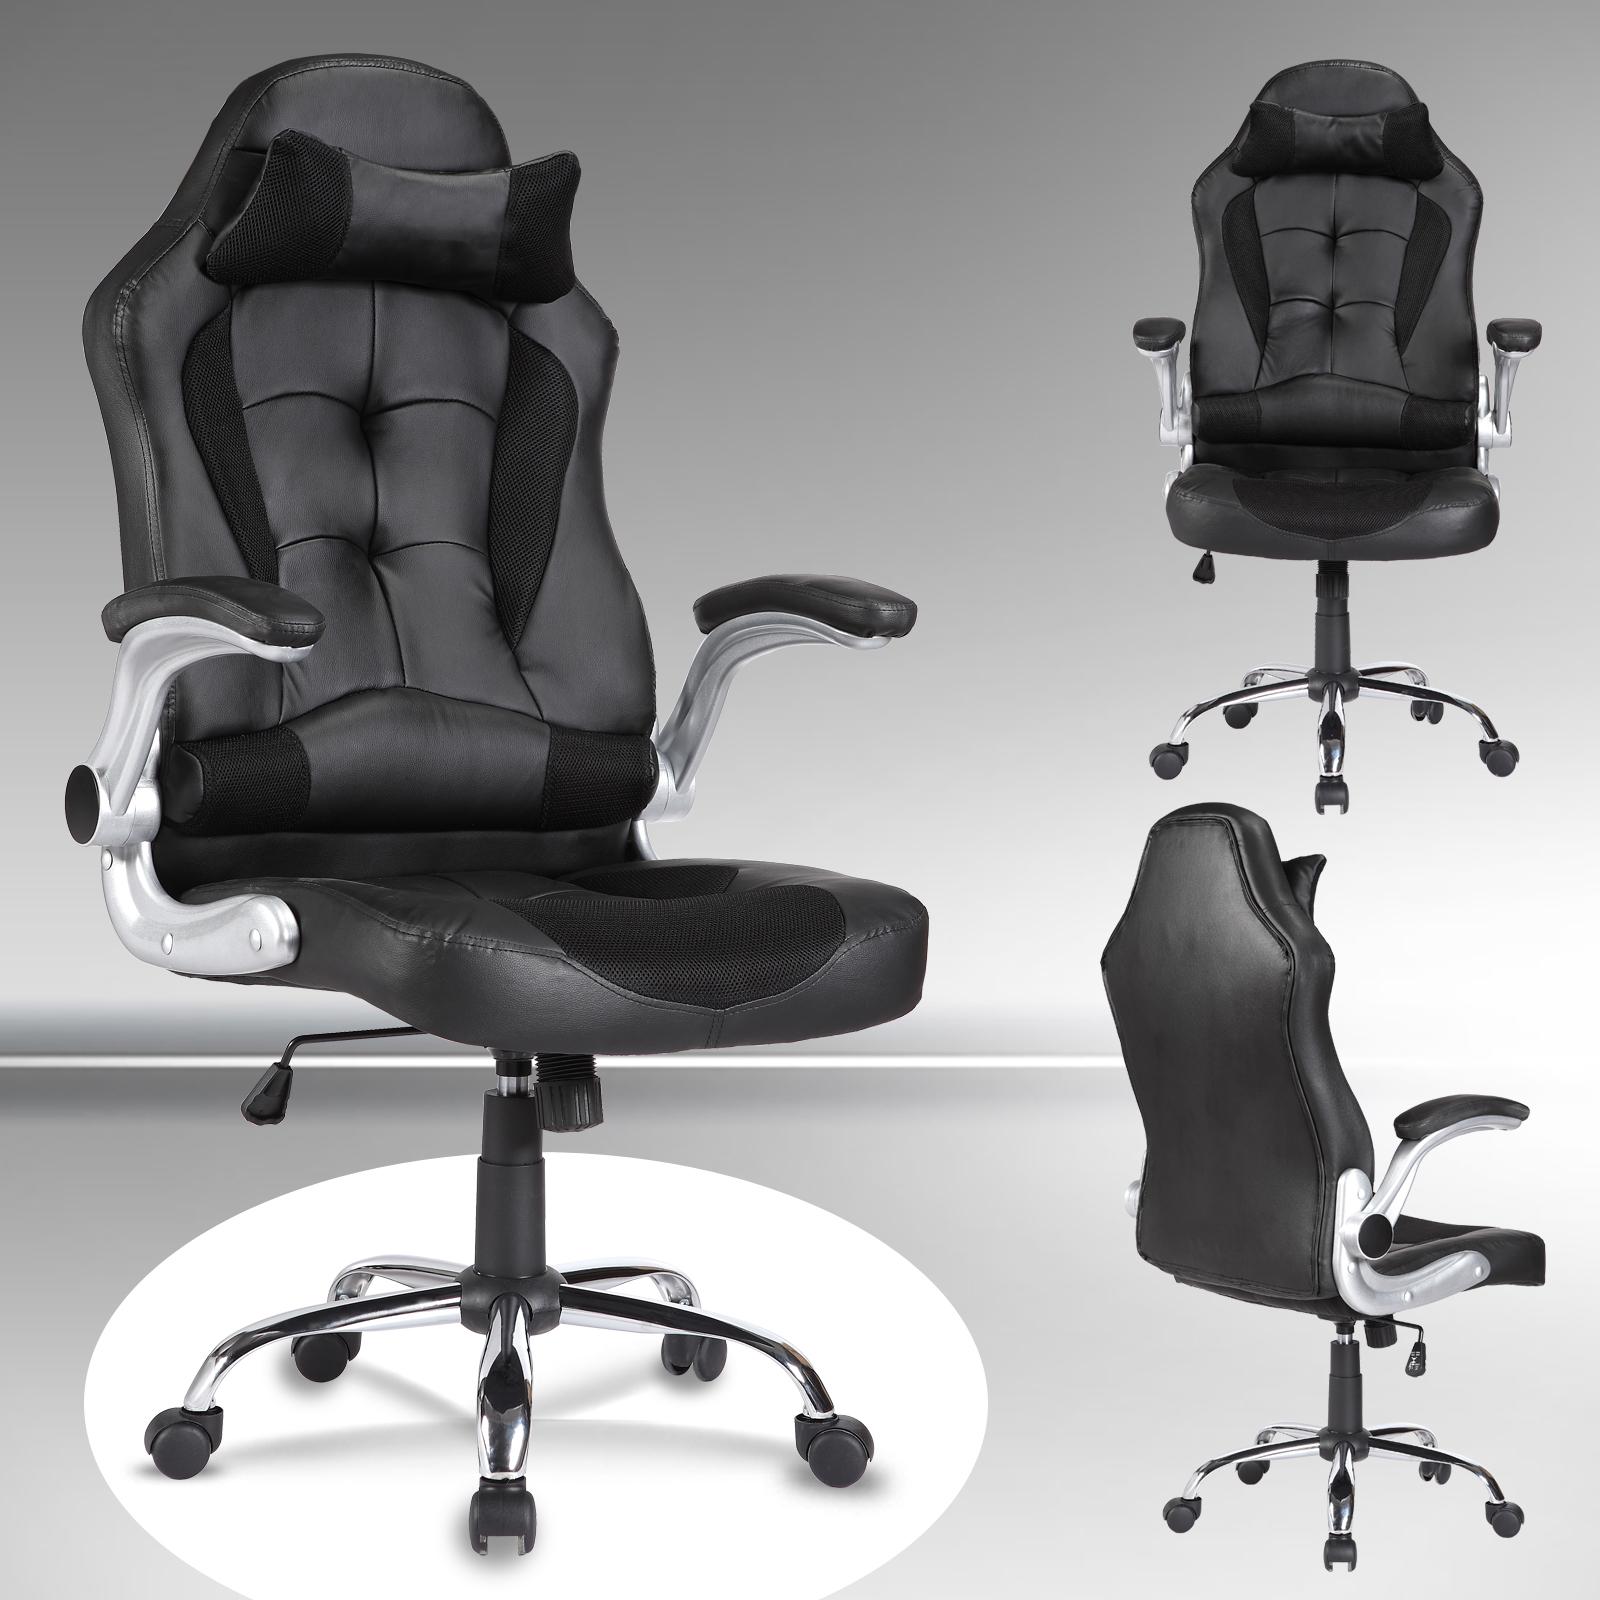 chaise fauteuil de bureau luxe id al confortable si ge. Black Bedroom Furniture Sets. Home Design Ideas